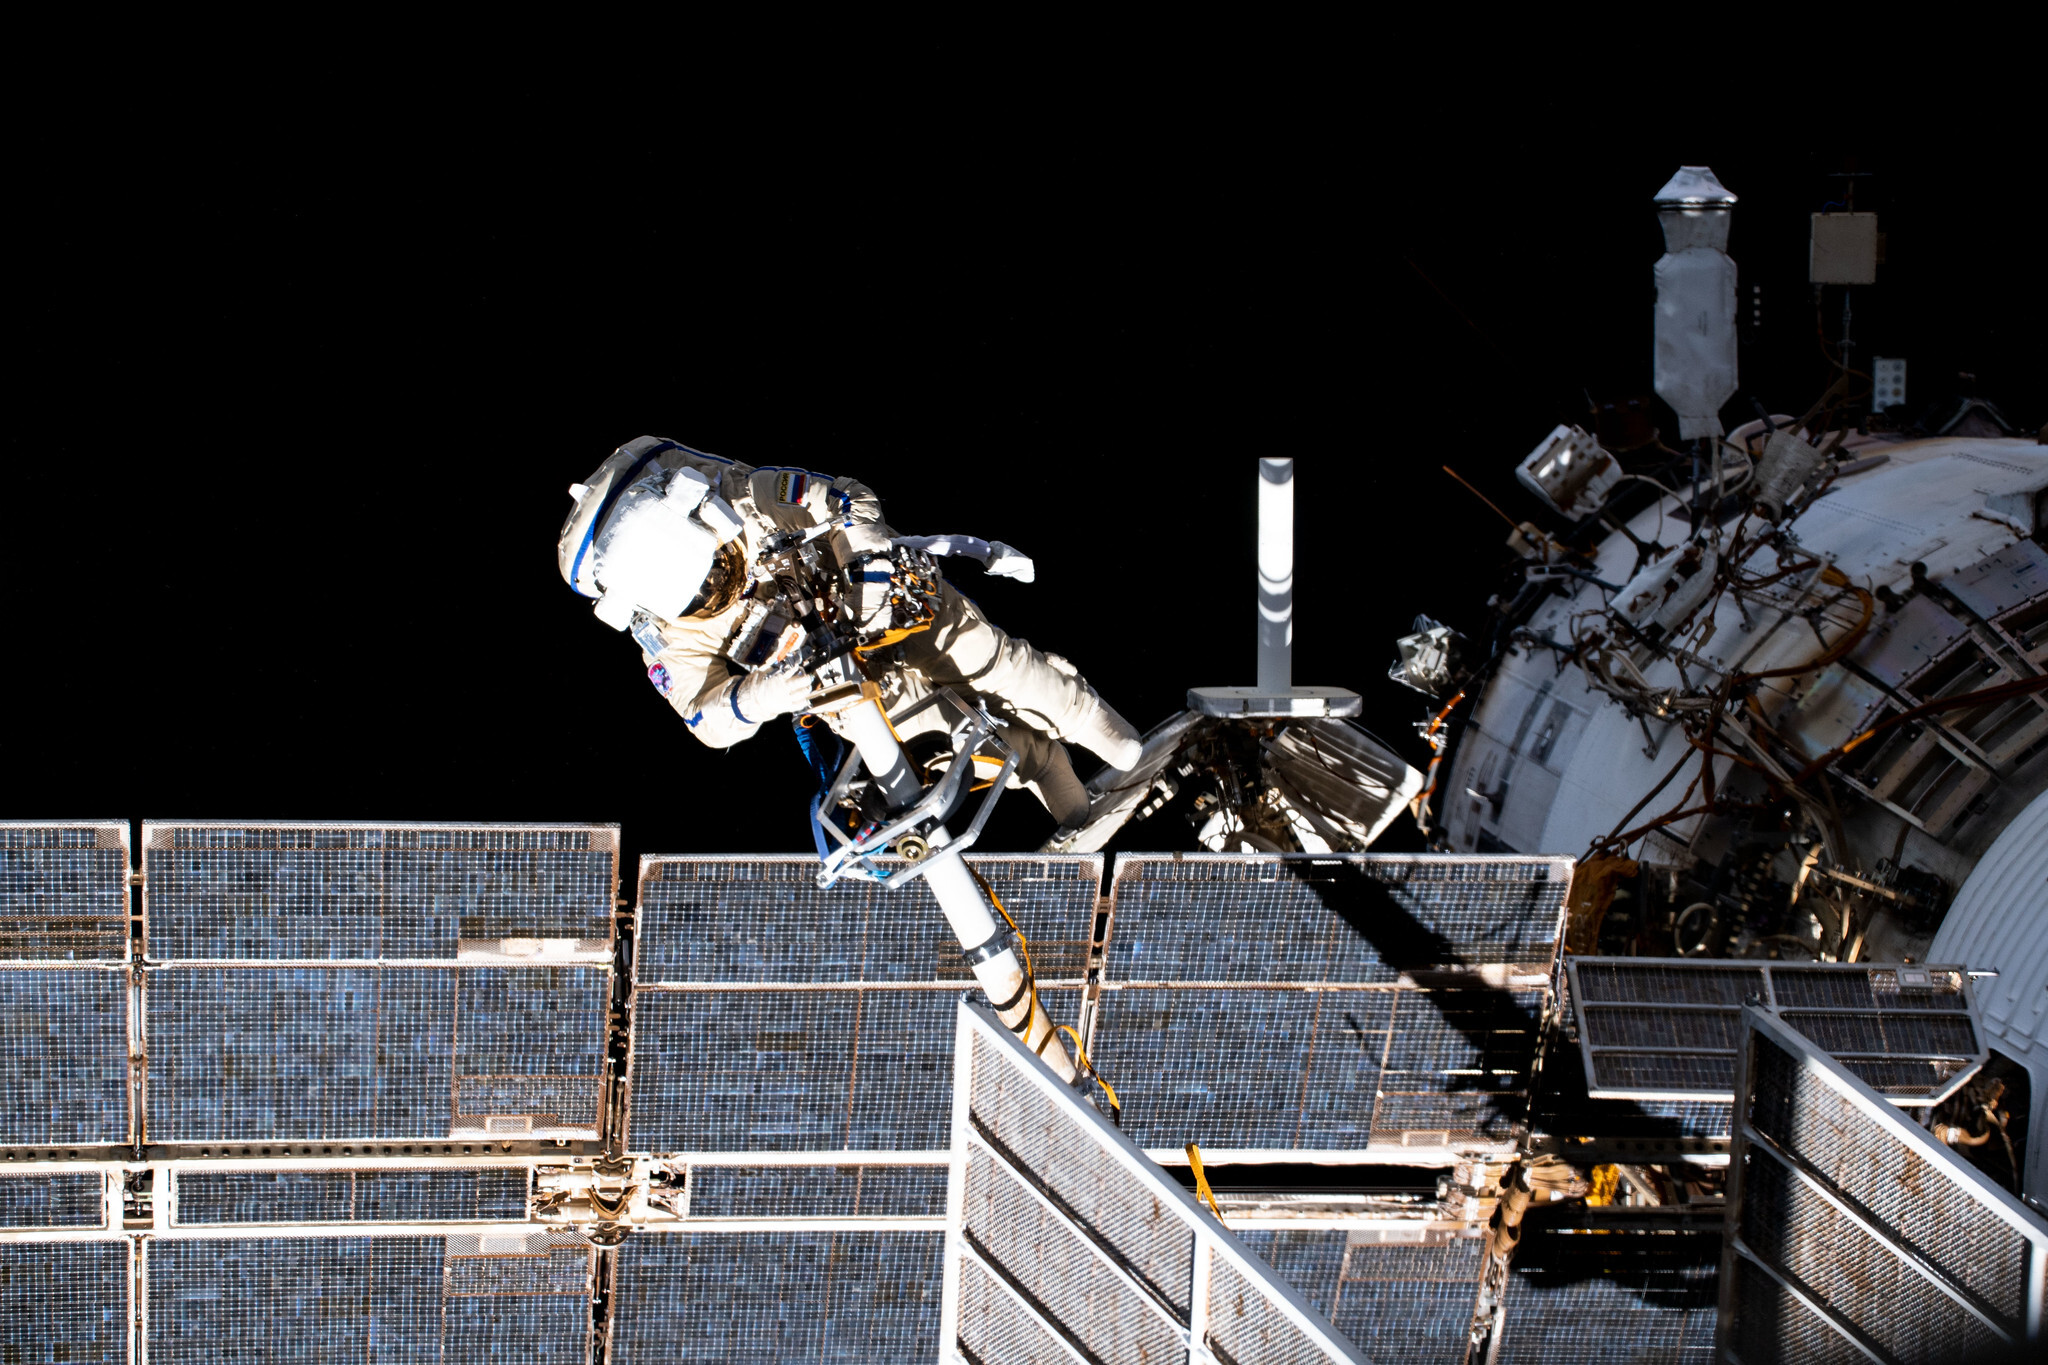 Russian cosmonauts conduct spacewalk despite smoke, alarm on space station